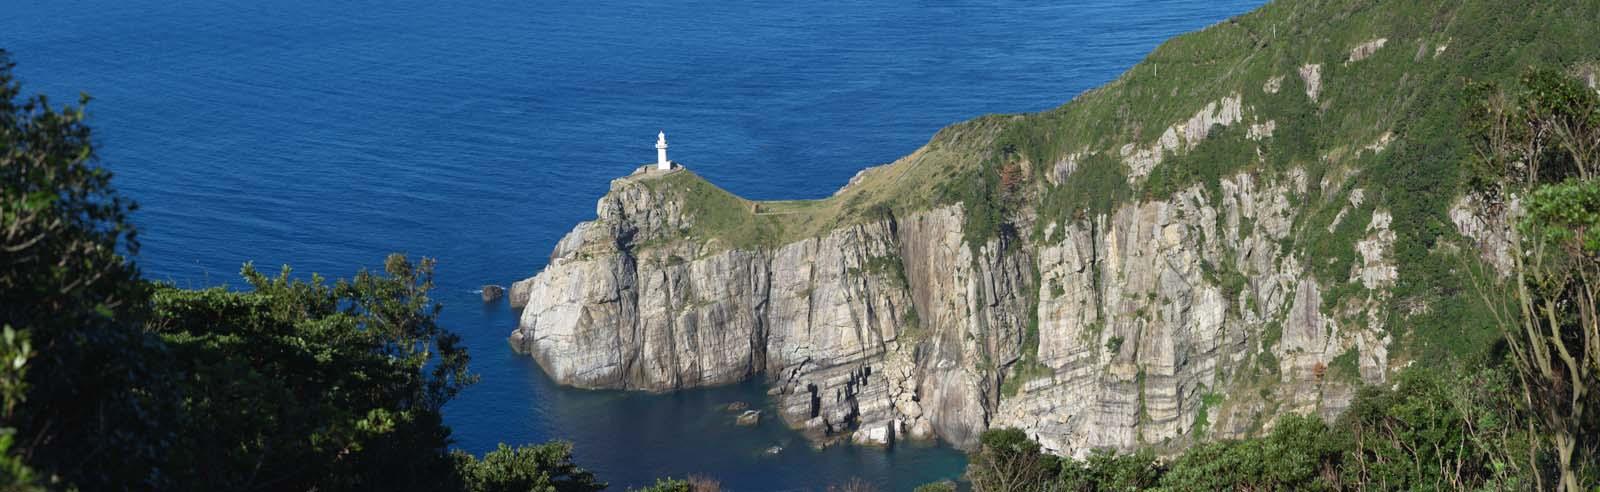 photo,material,free,landscape,picture,stock photo,Creative Commons,Large Sezaki whole view, cliff, The sea, blue sky, Great Sezaki Lighthouse